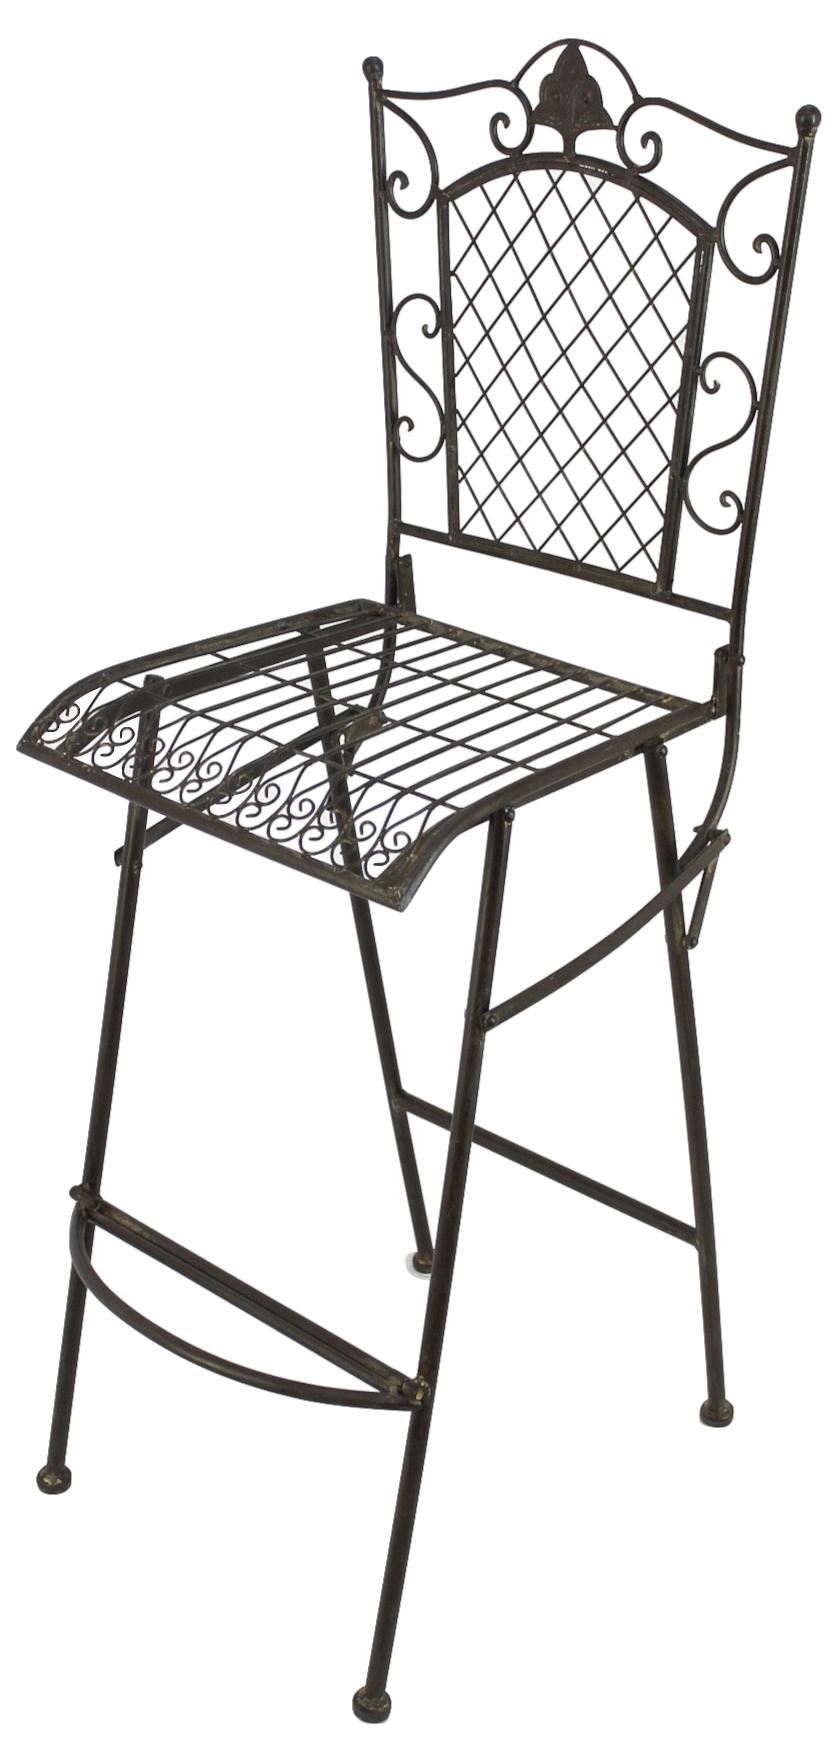 Barhocker klappstuhl 20833 aus metall hocker gartenstuhl hochstuhl sitzhocker dandibo - Klappstuhl garten metall ...